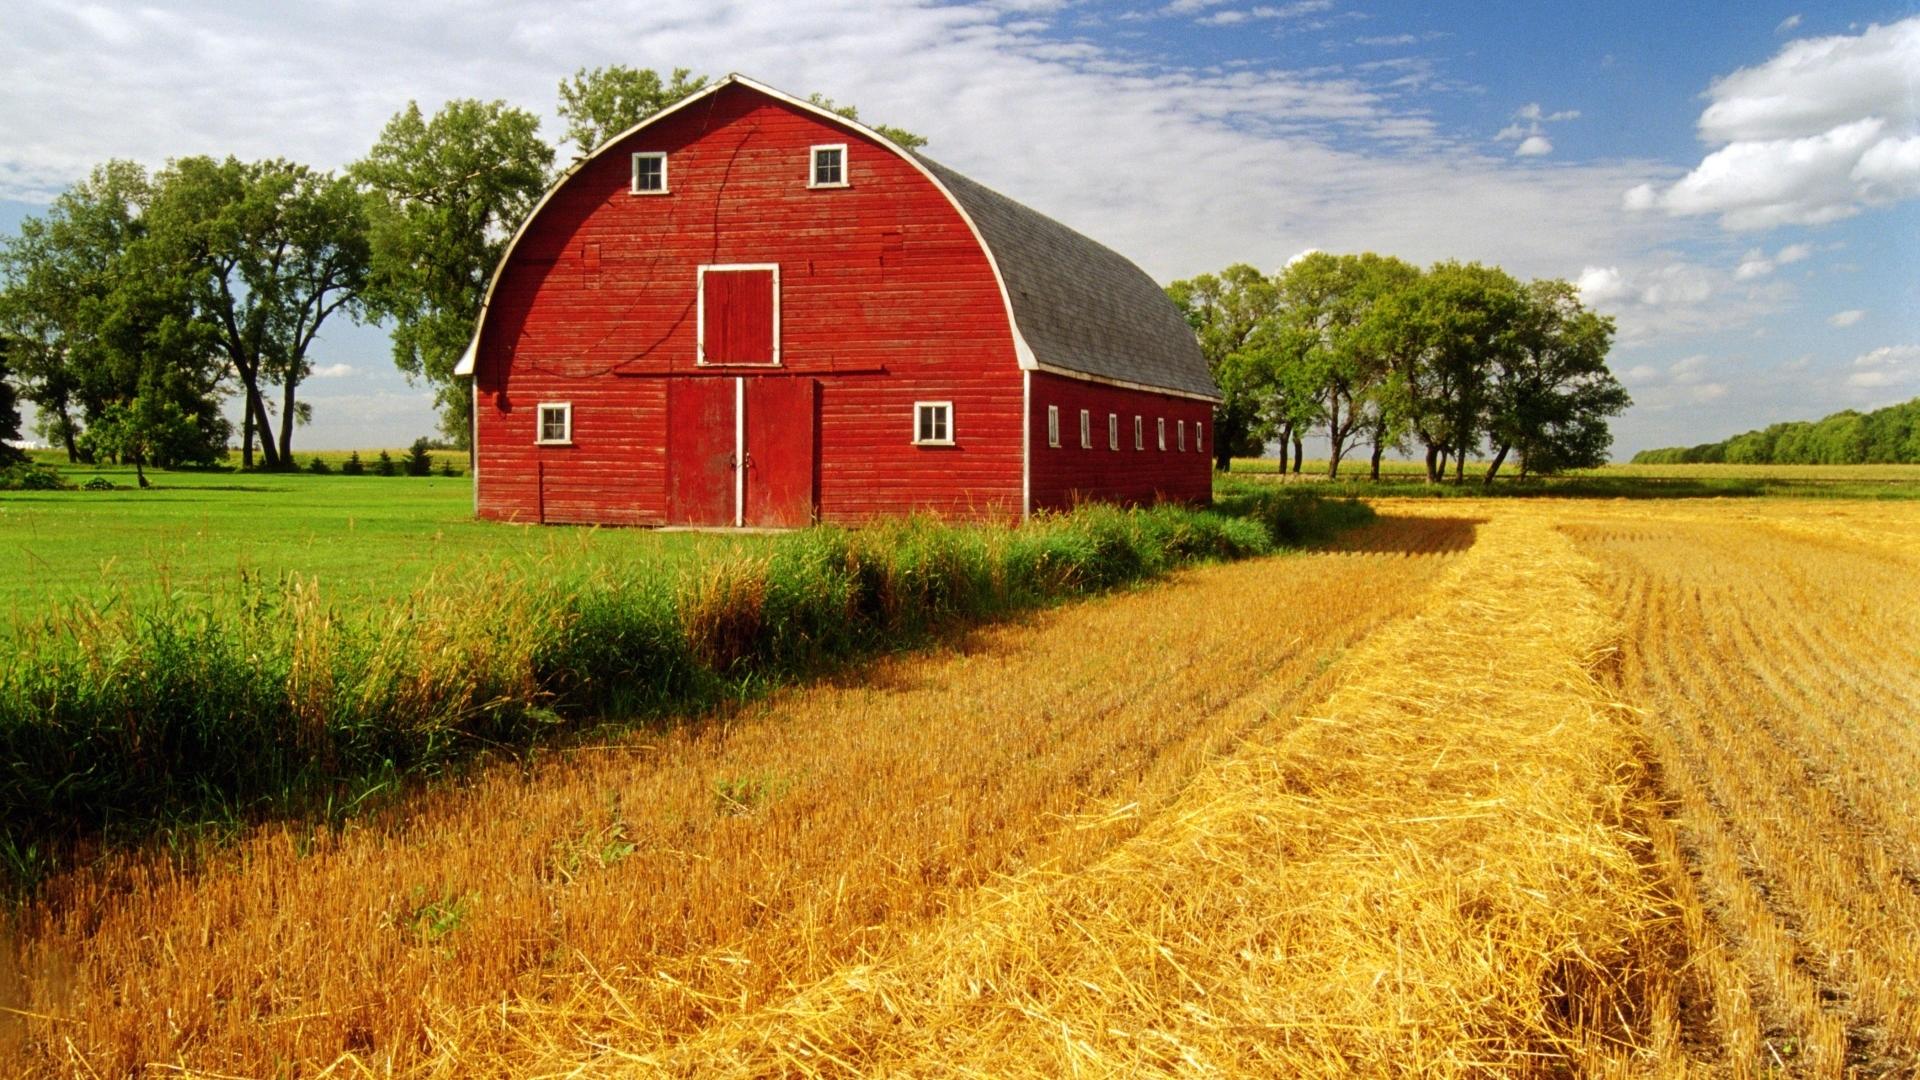 Barn Rustic Farm Landscapes Fields Crop Grass Sky Clouds Wallpaper |  1920x1080 | 34896 | WallpaperUP